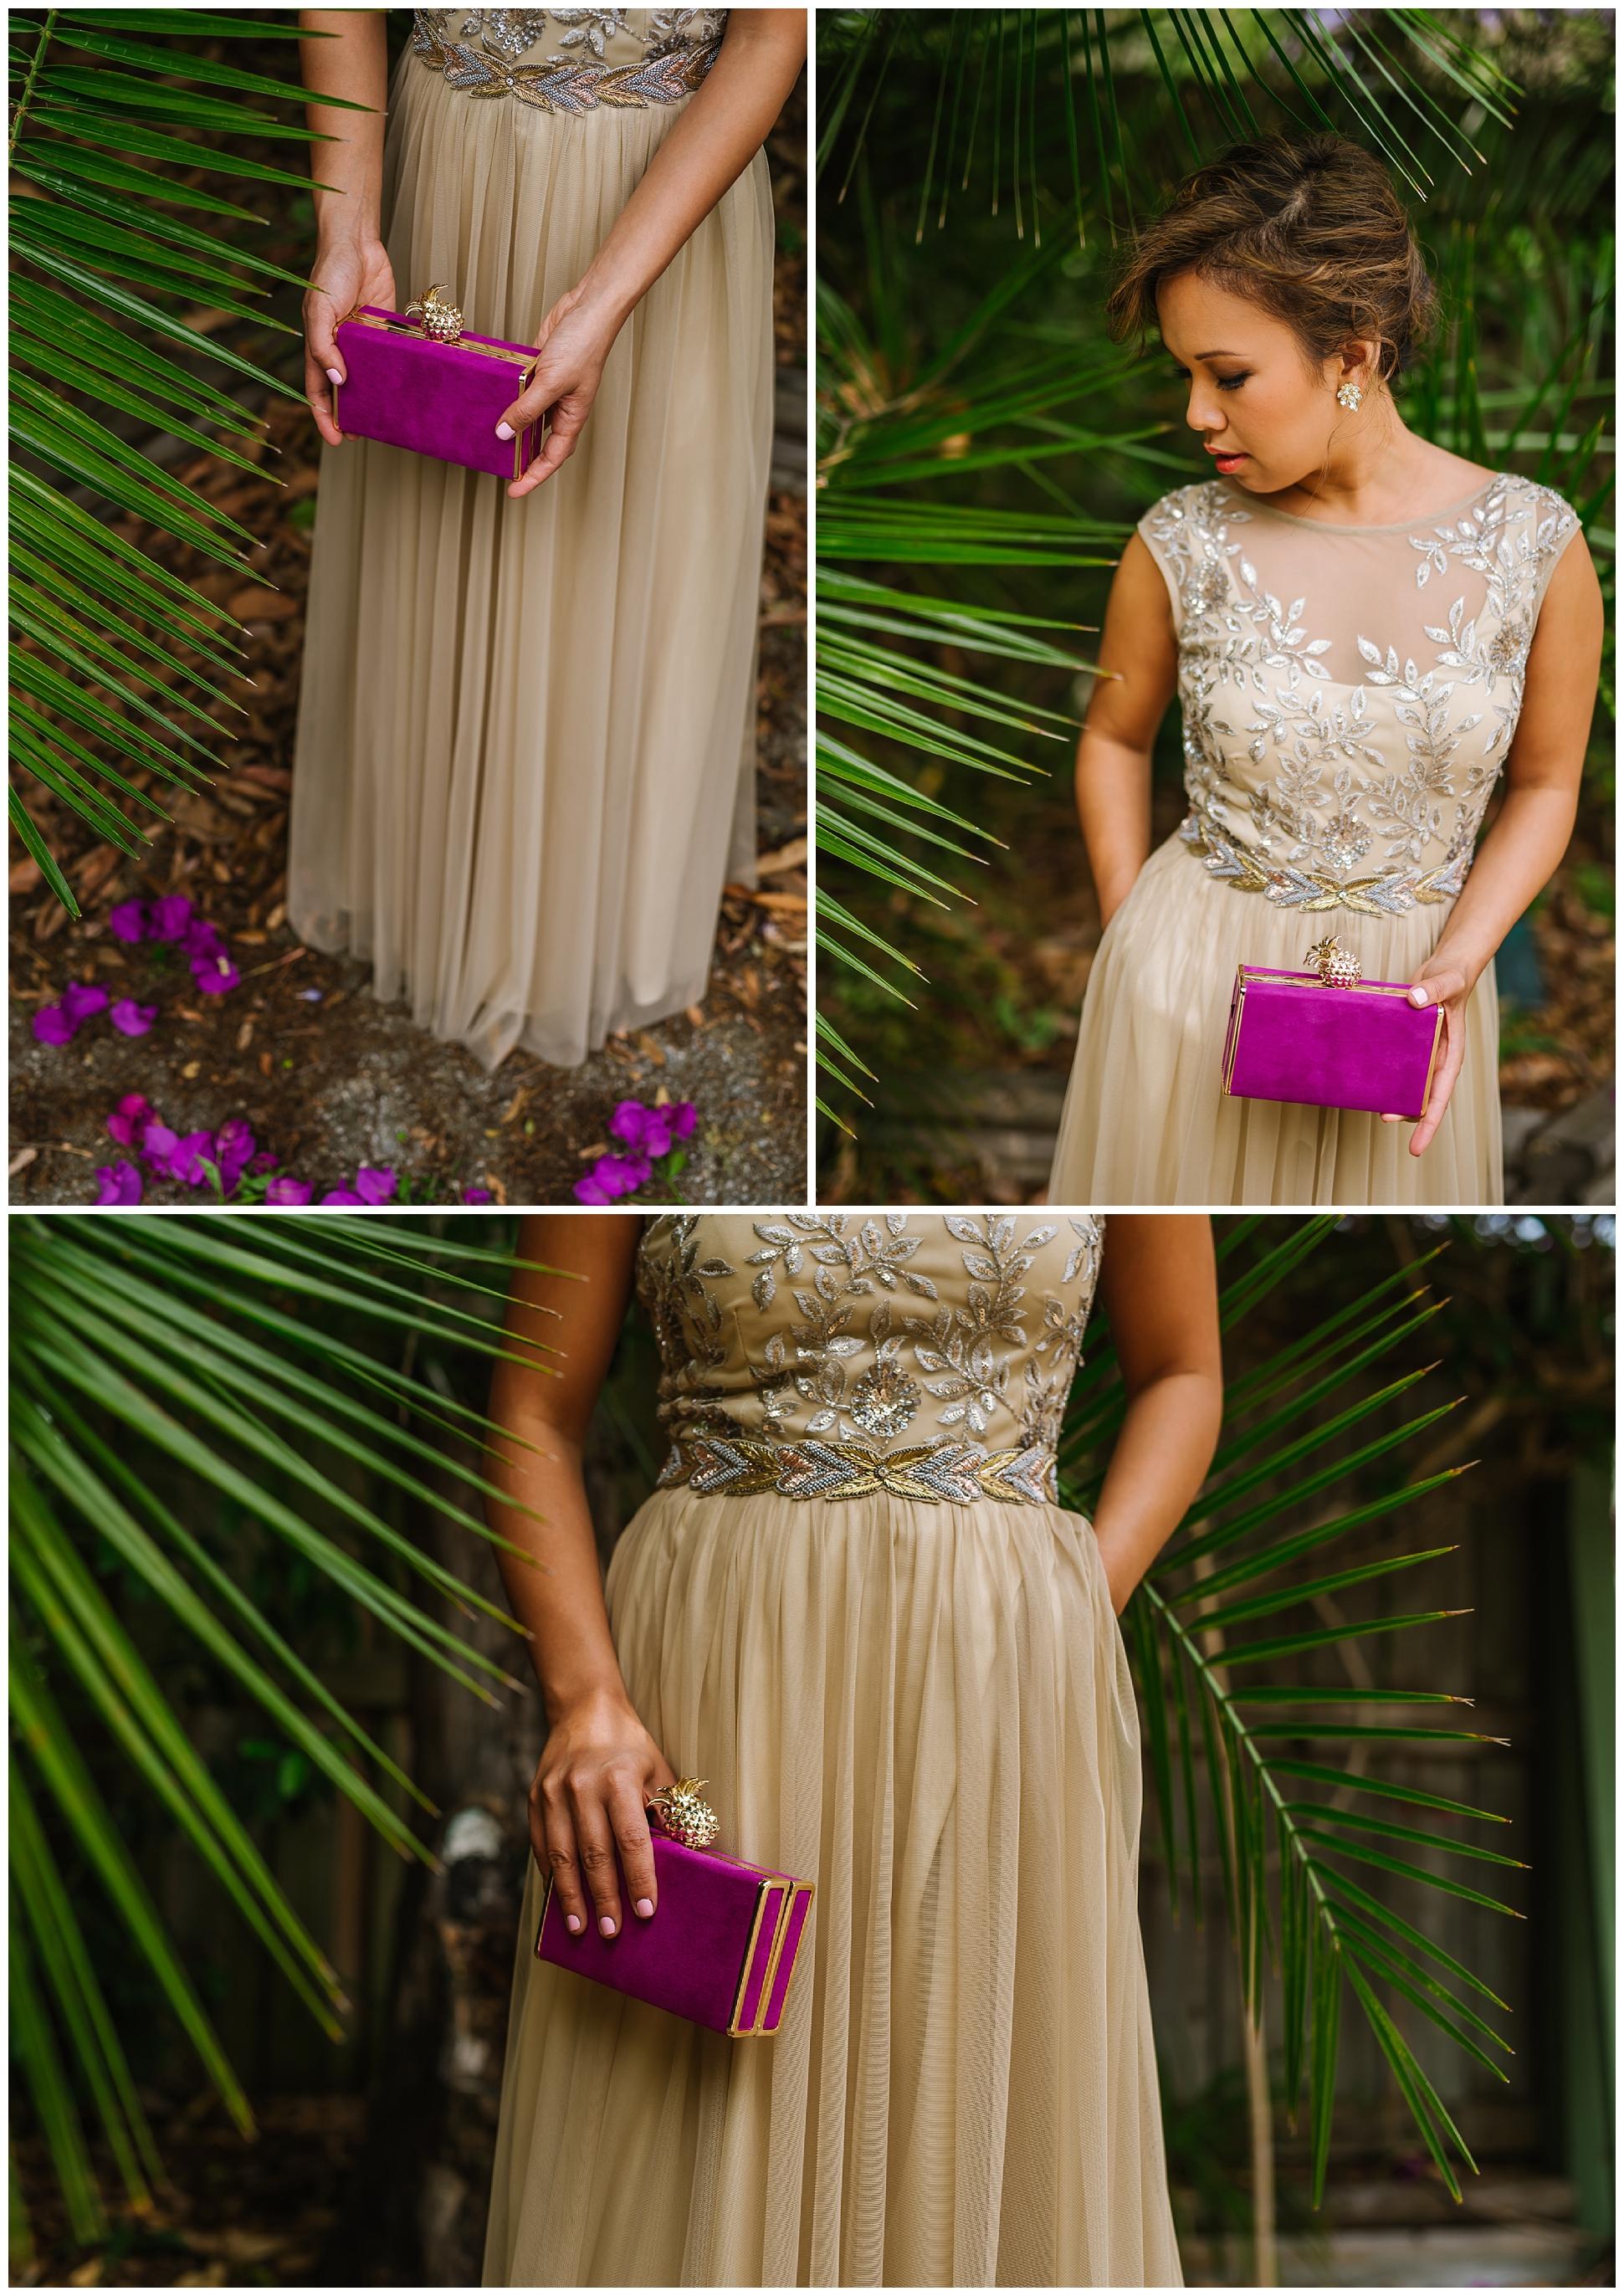 st-pete-wedding-photographer-italian-romance-theme-rustic-flower-crown_0385.jpg